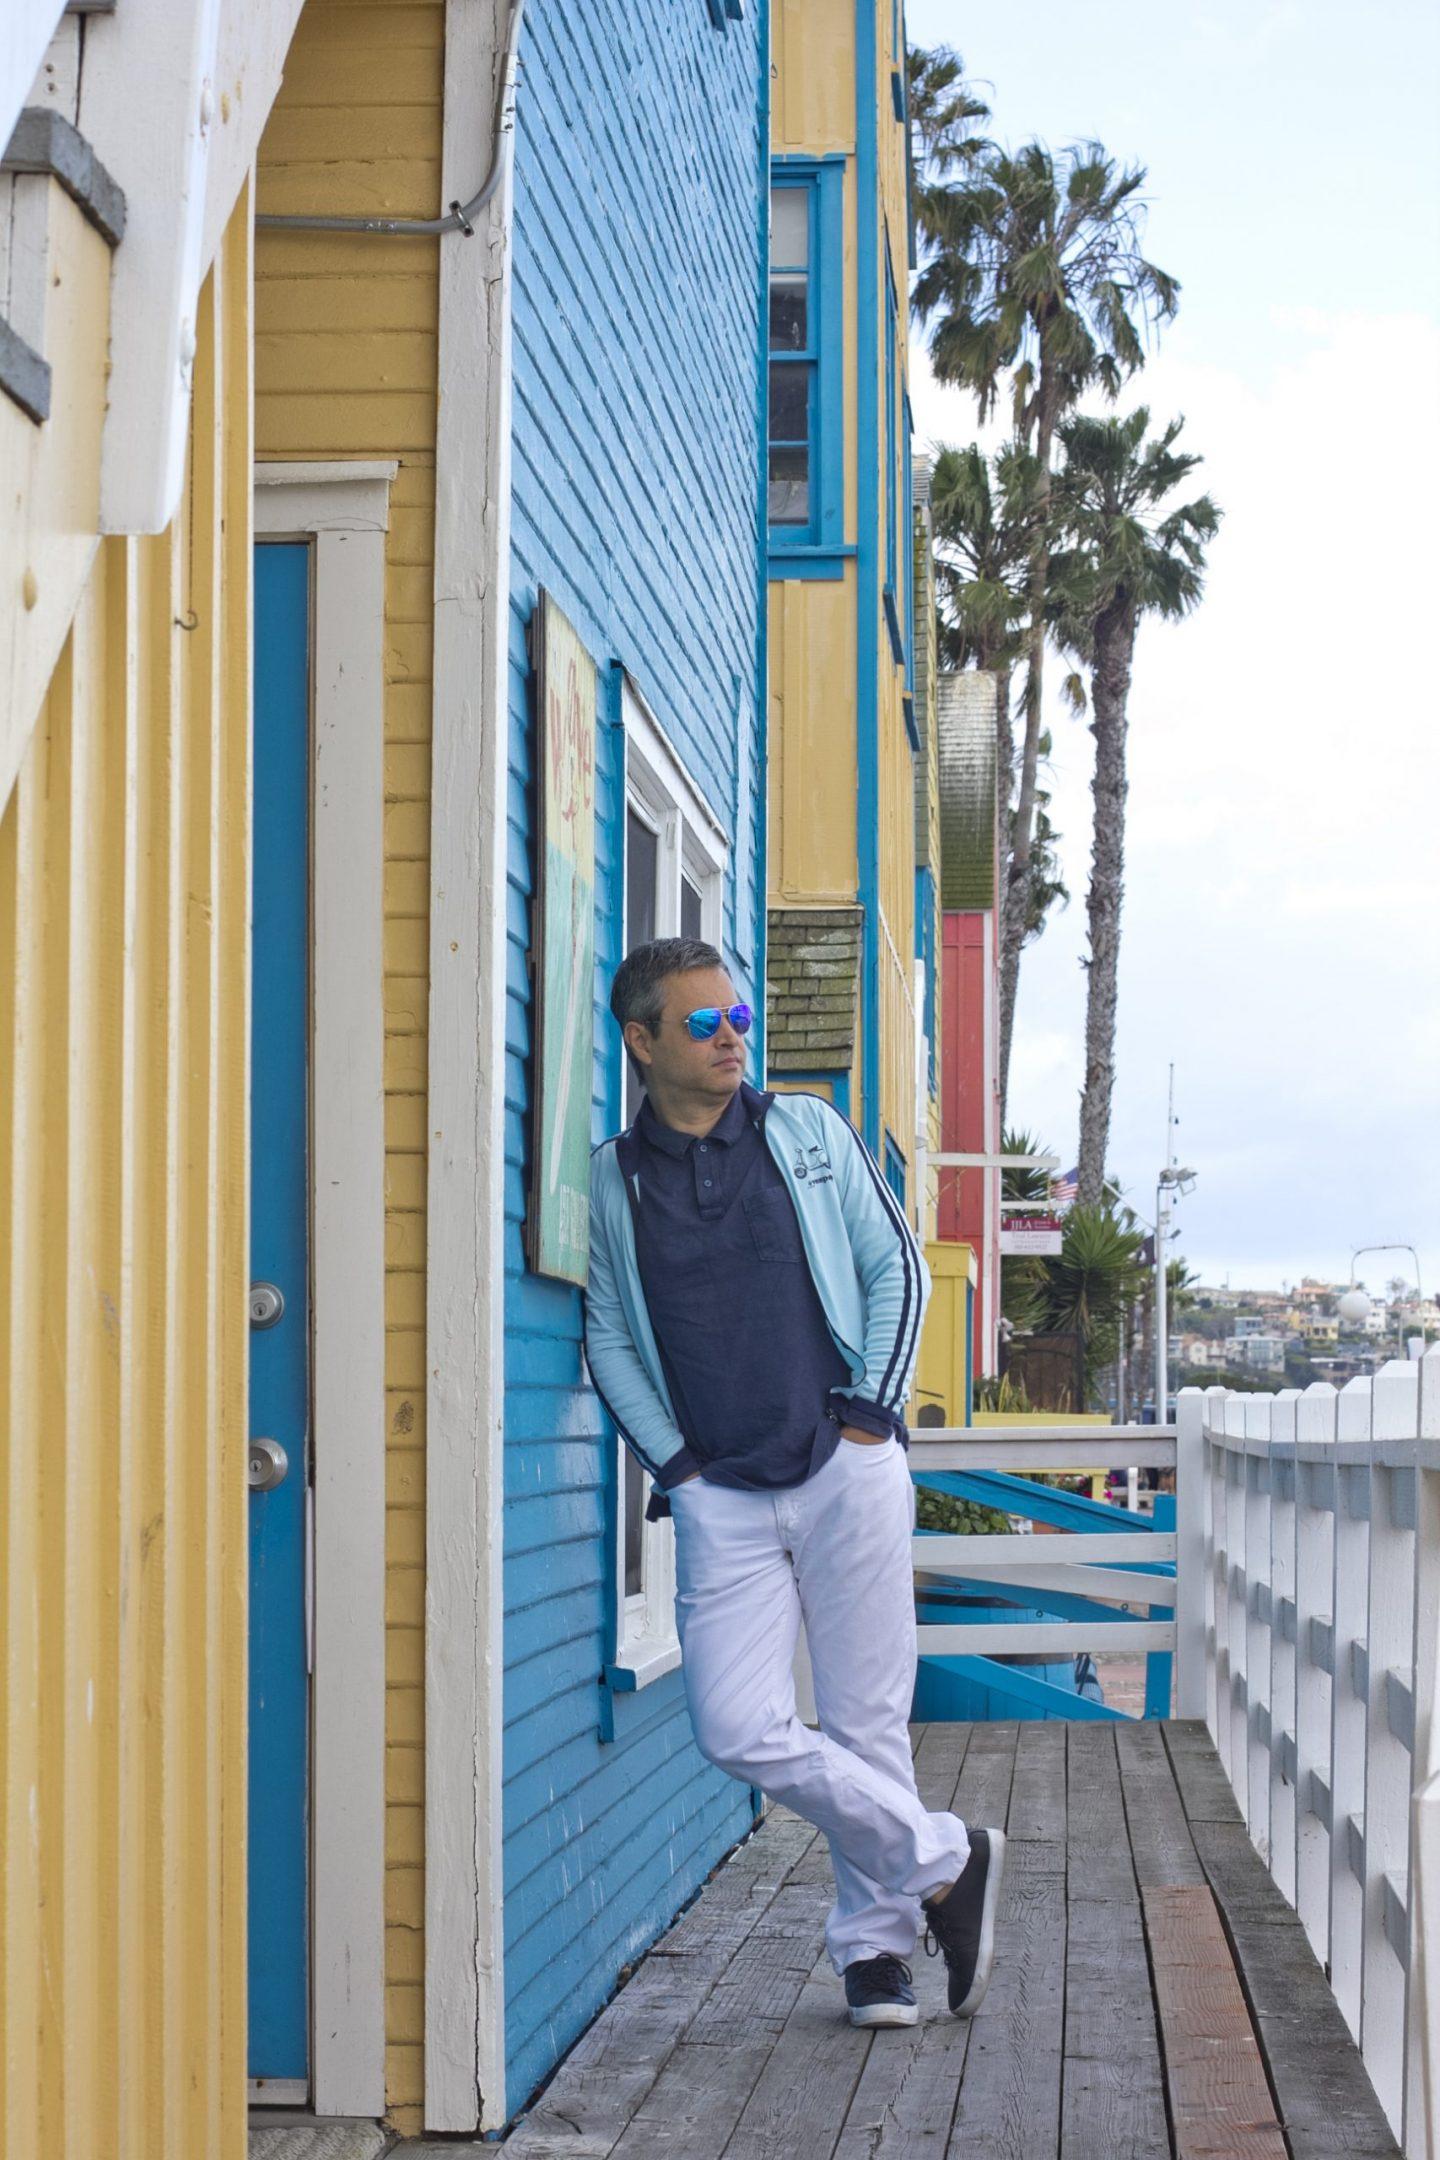 Enjoy the view Maui Jim sunglasses blogger